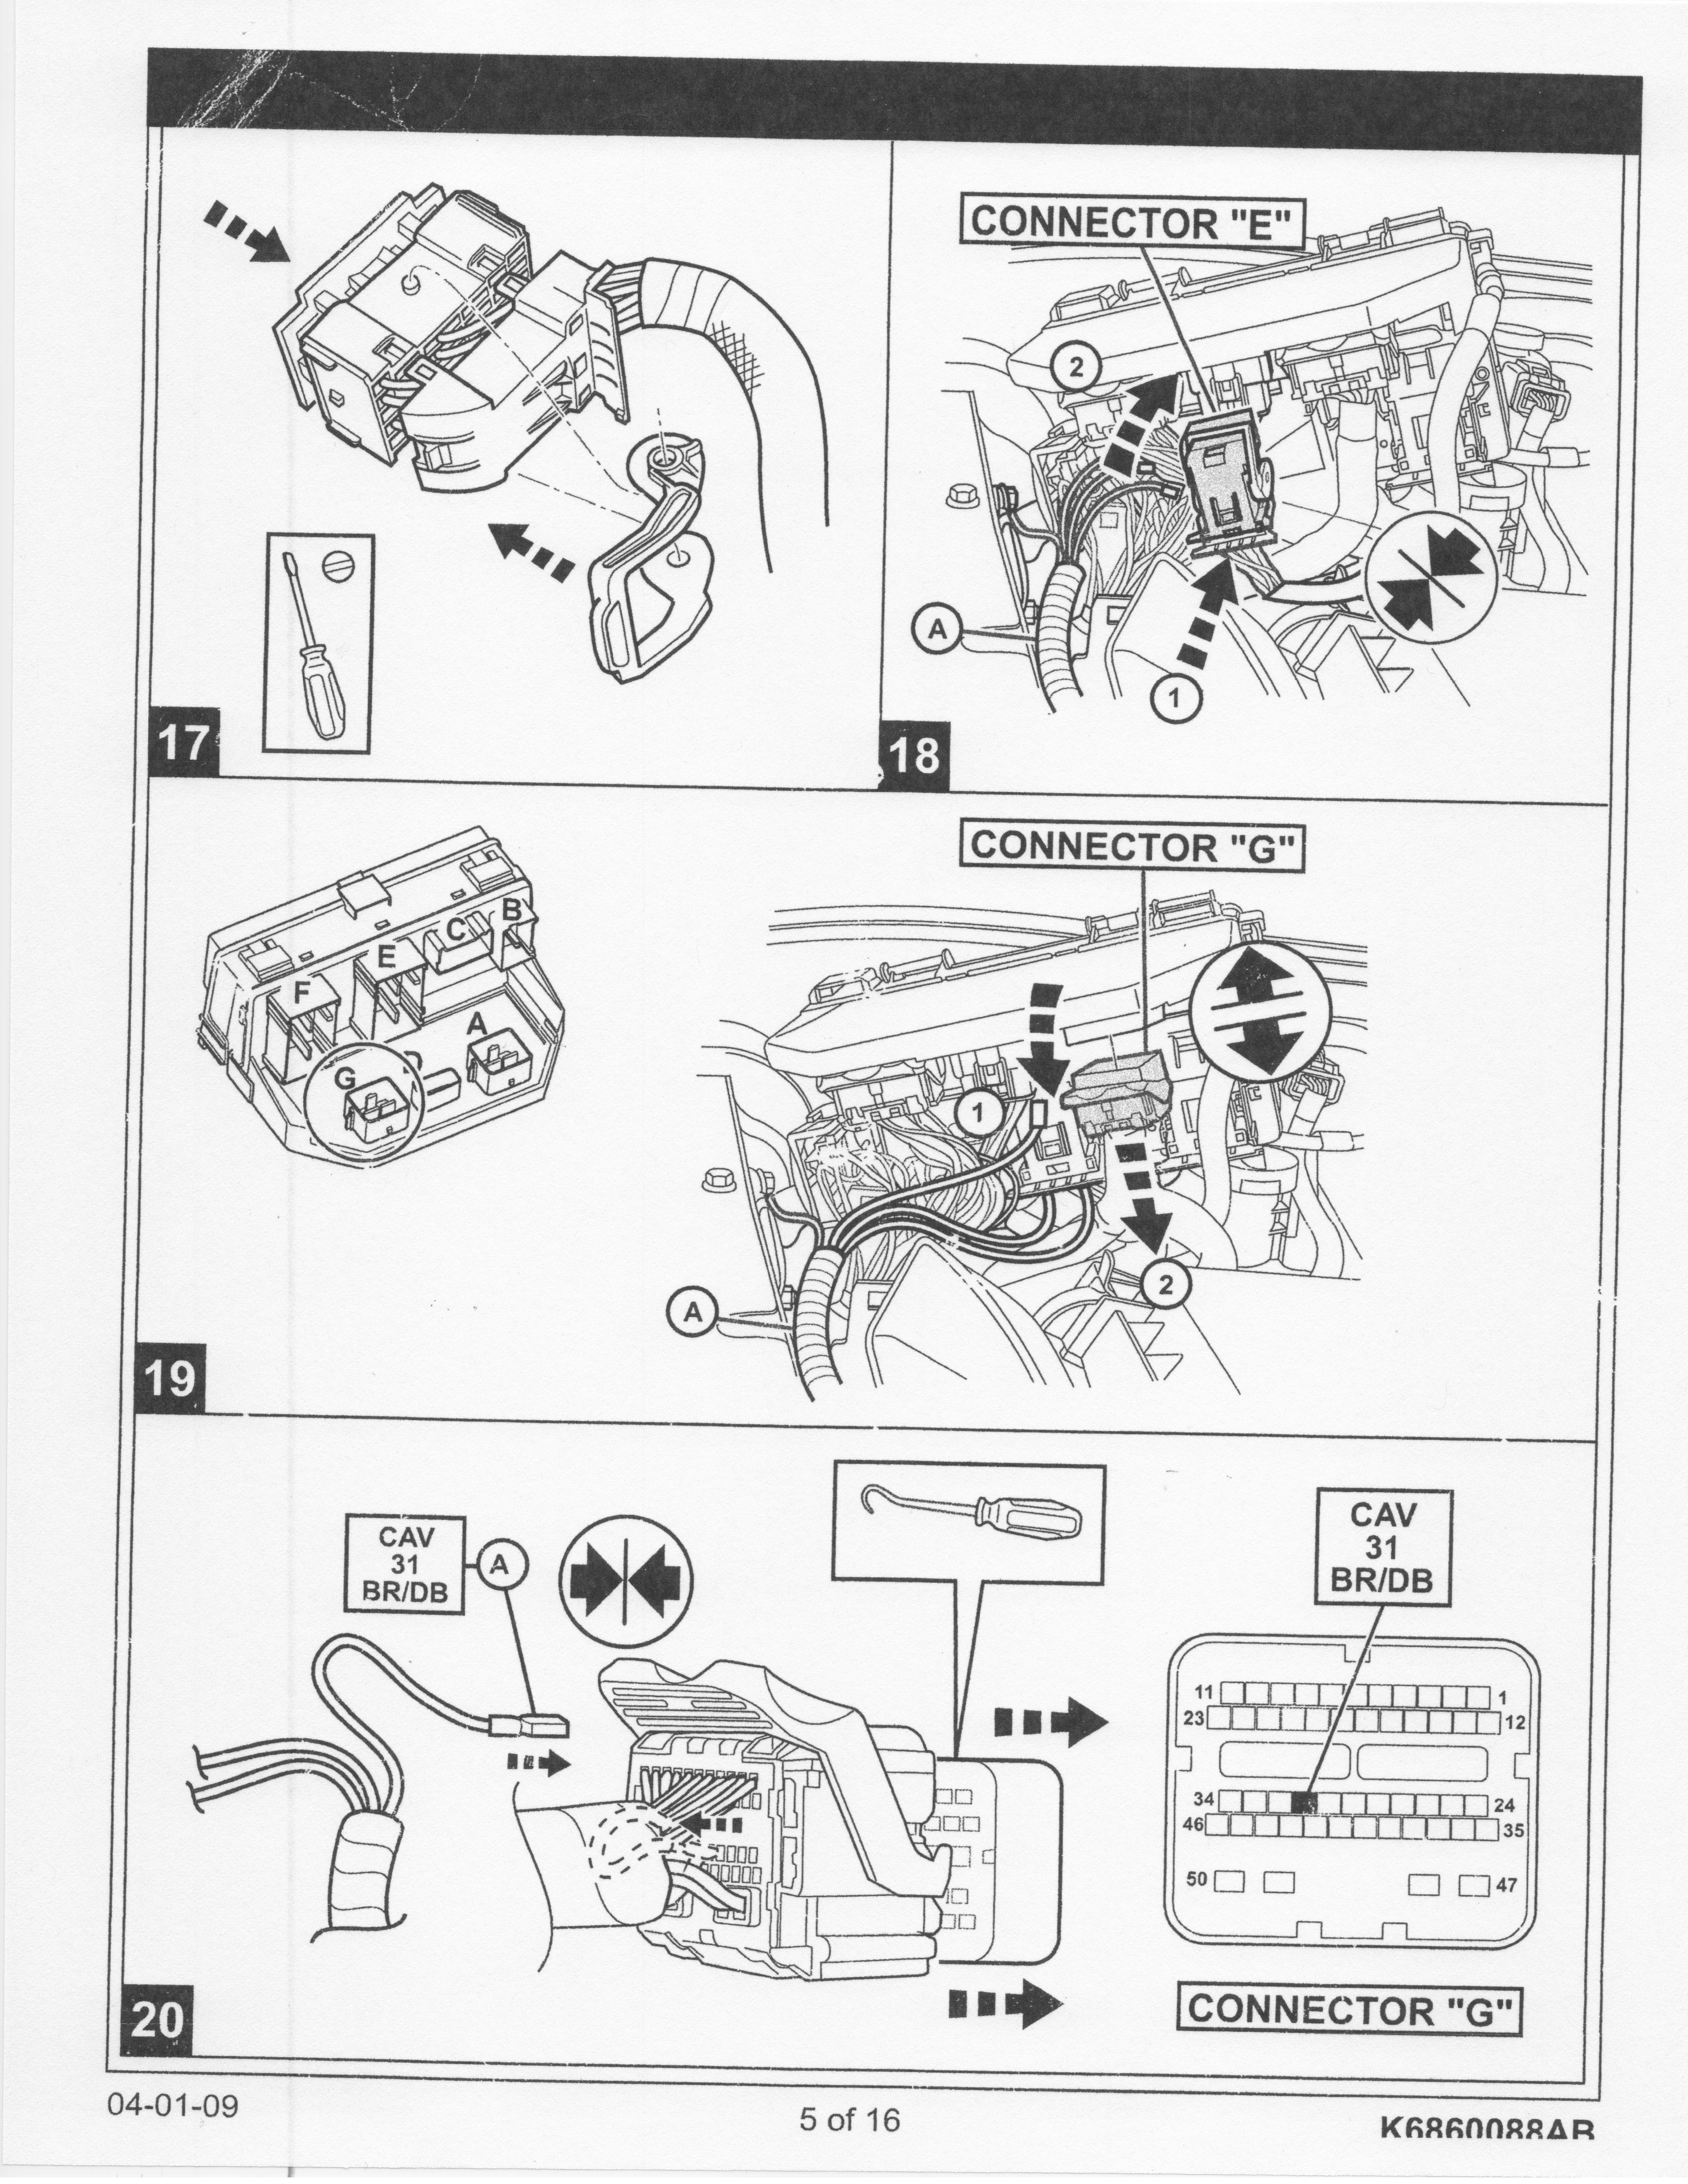 jeep wrangler wiring diagram hard top wiring diagram blog 2002 jeep wrangler wiring diagram hard top 2008 jeep wrangler hardtop wiring harness wipers air